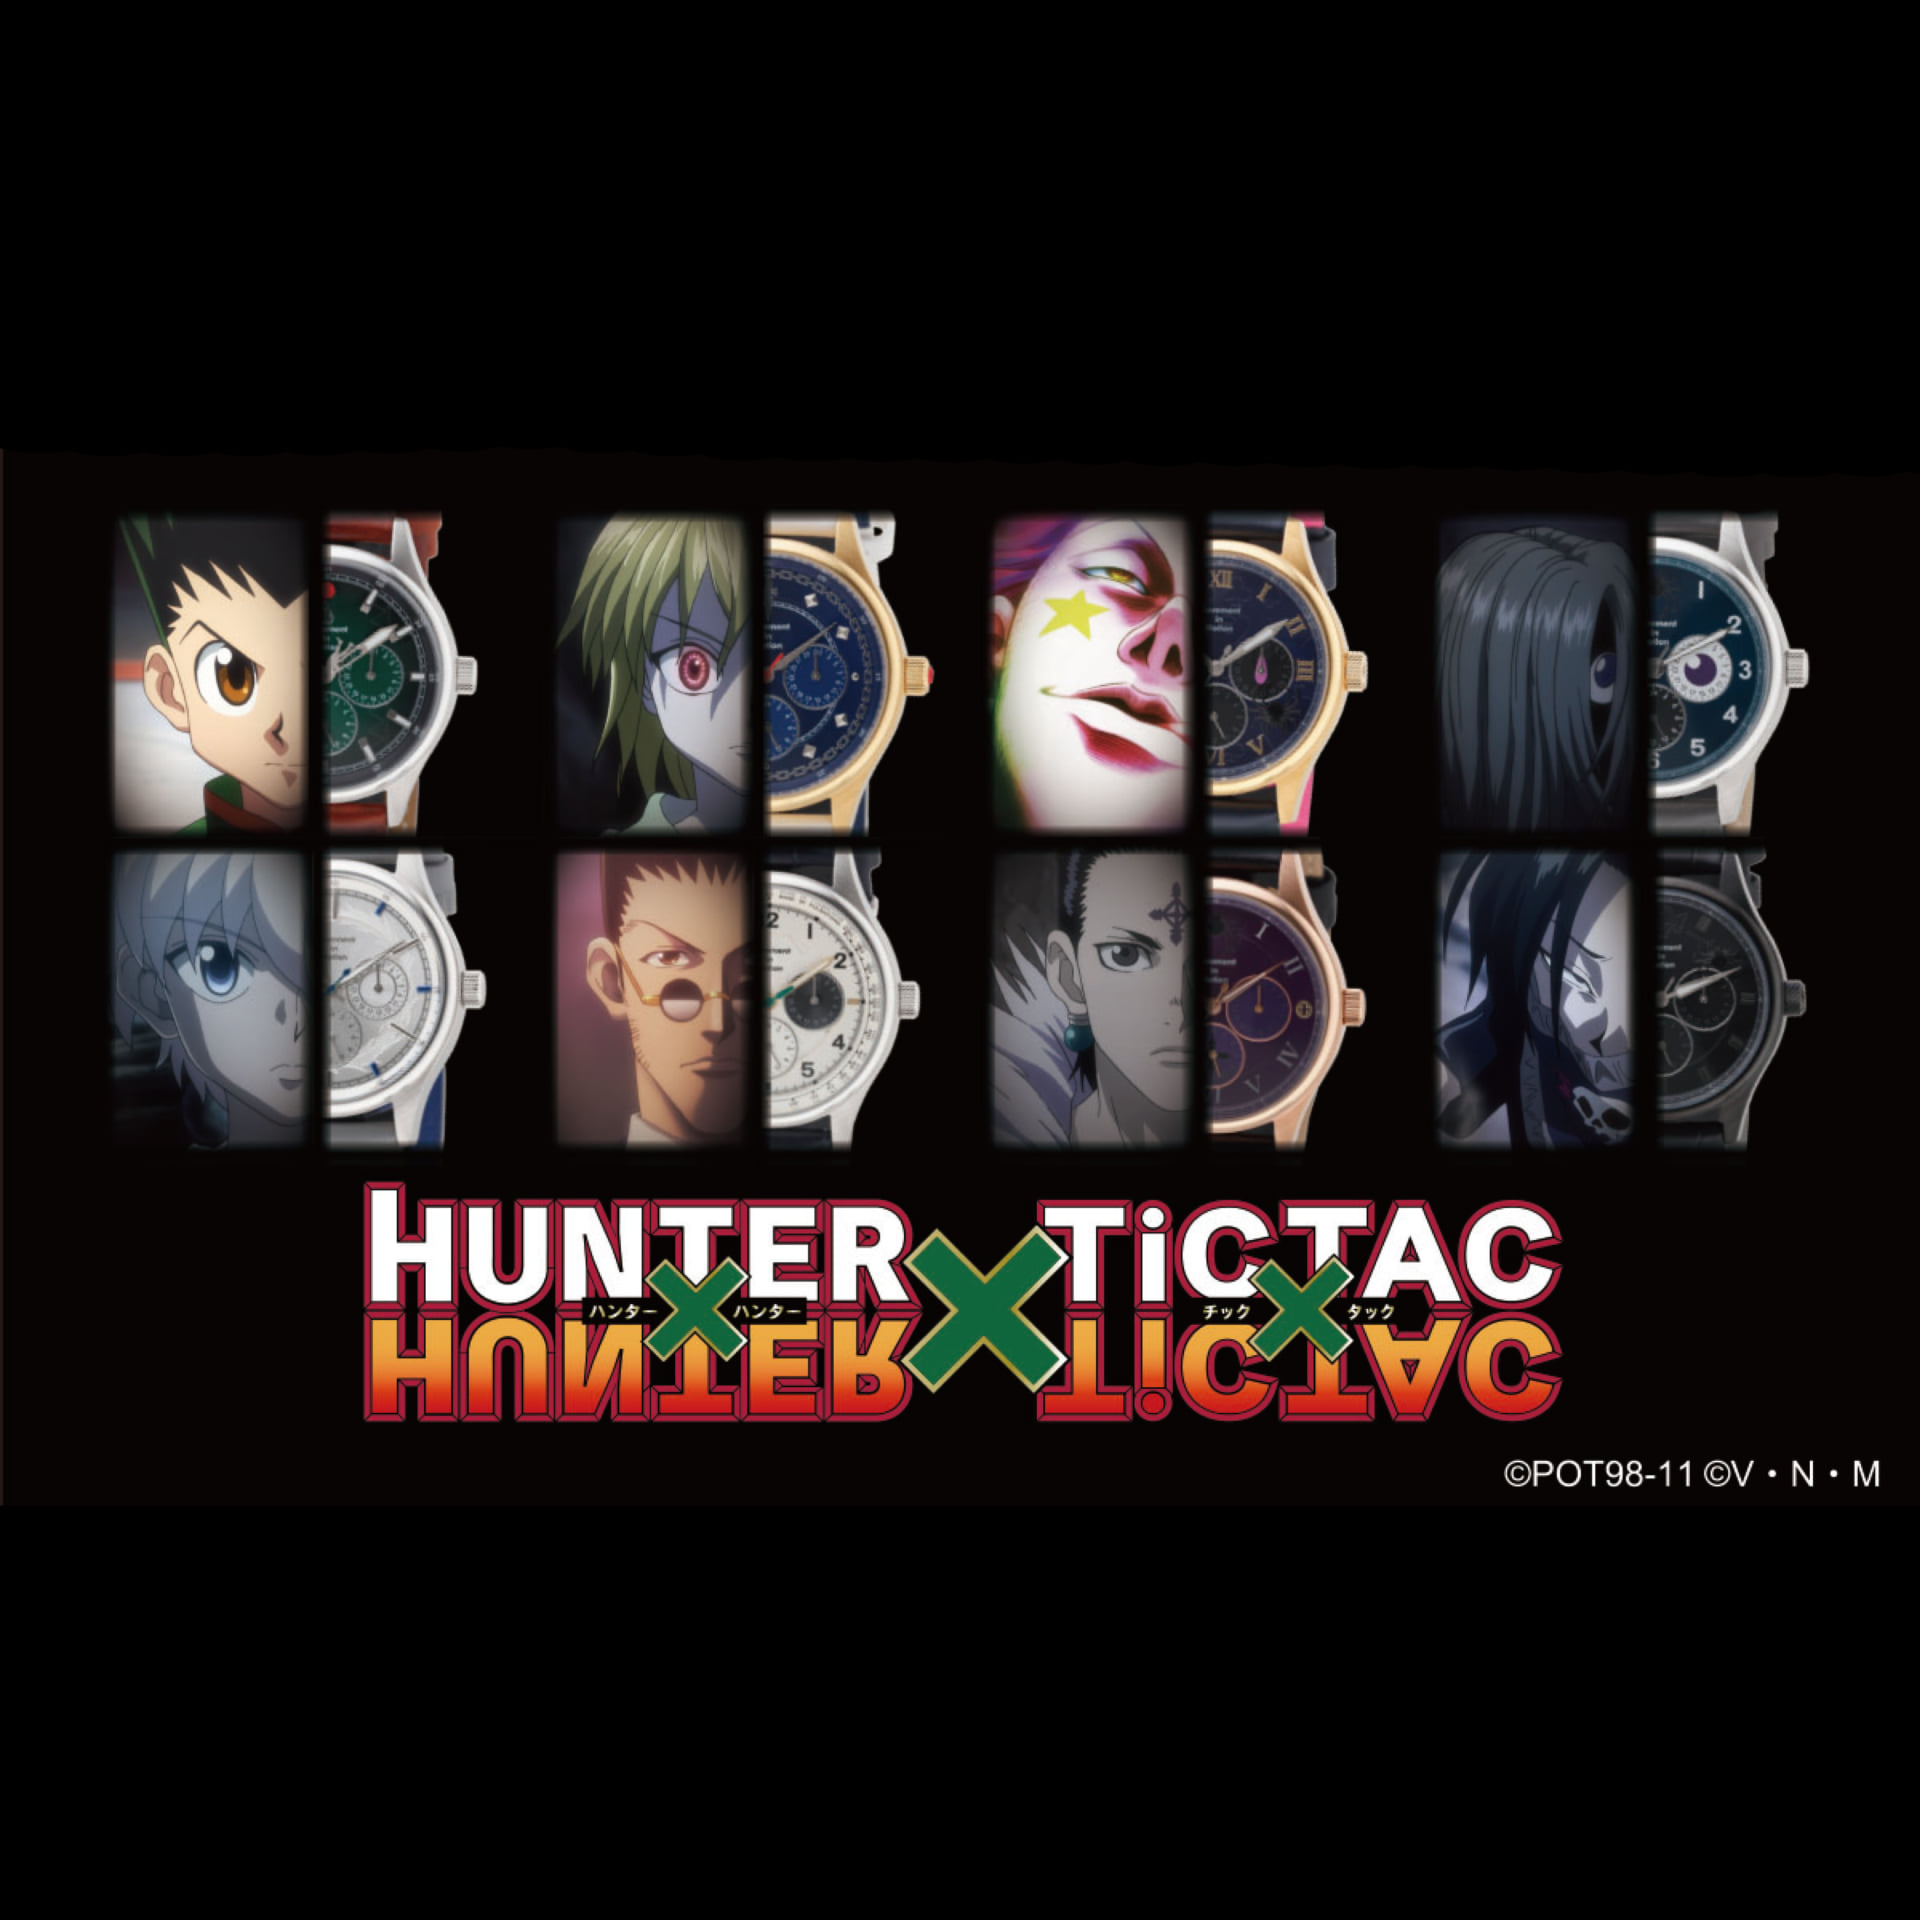 HUNTER×HUNTERとTiCTACの初コラボレーション腕時計が登場|ゴンやヒソカたち、人気キャラクターを表現 main-2-e1570092675581